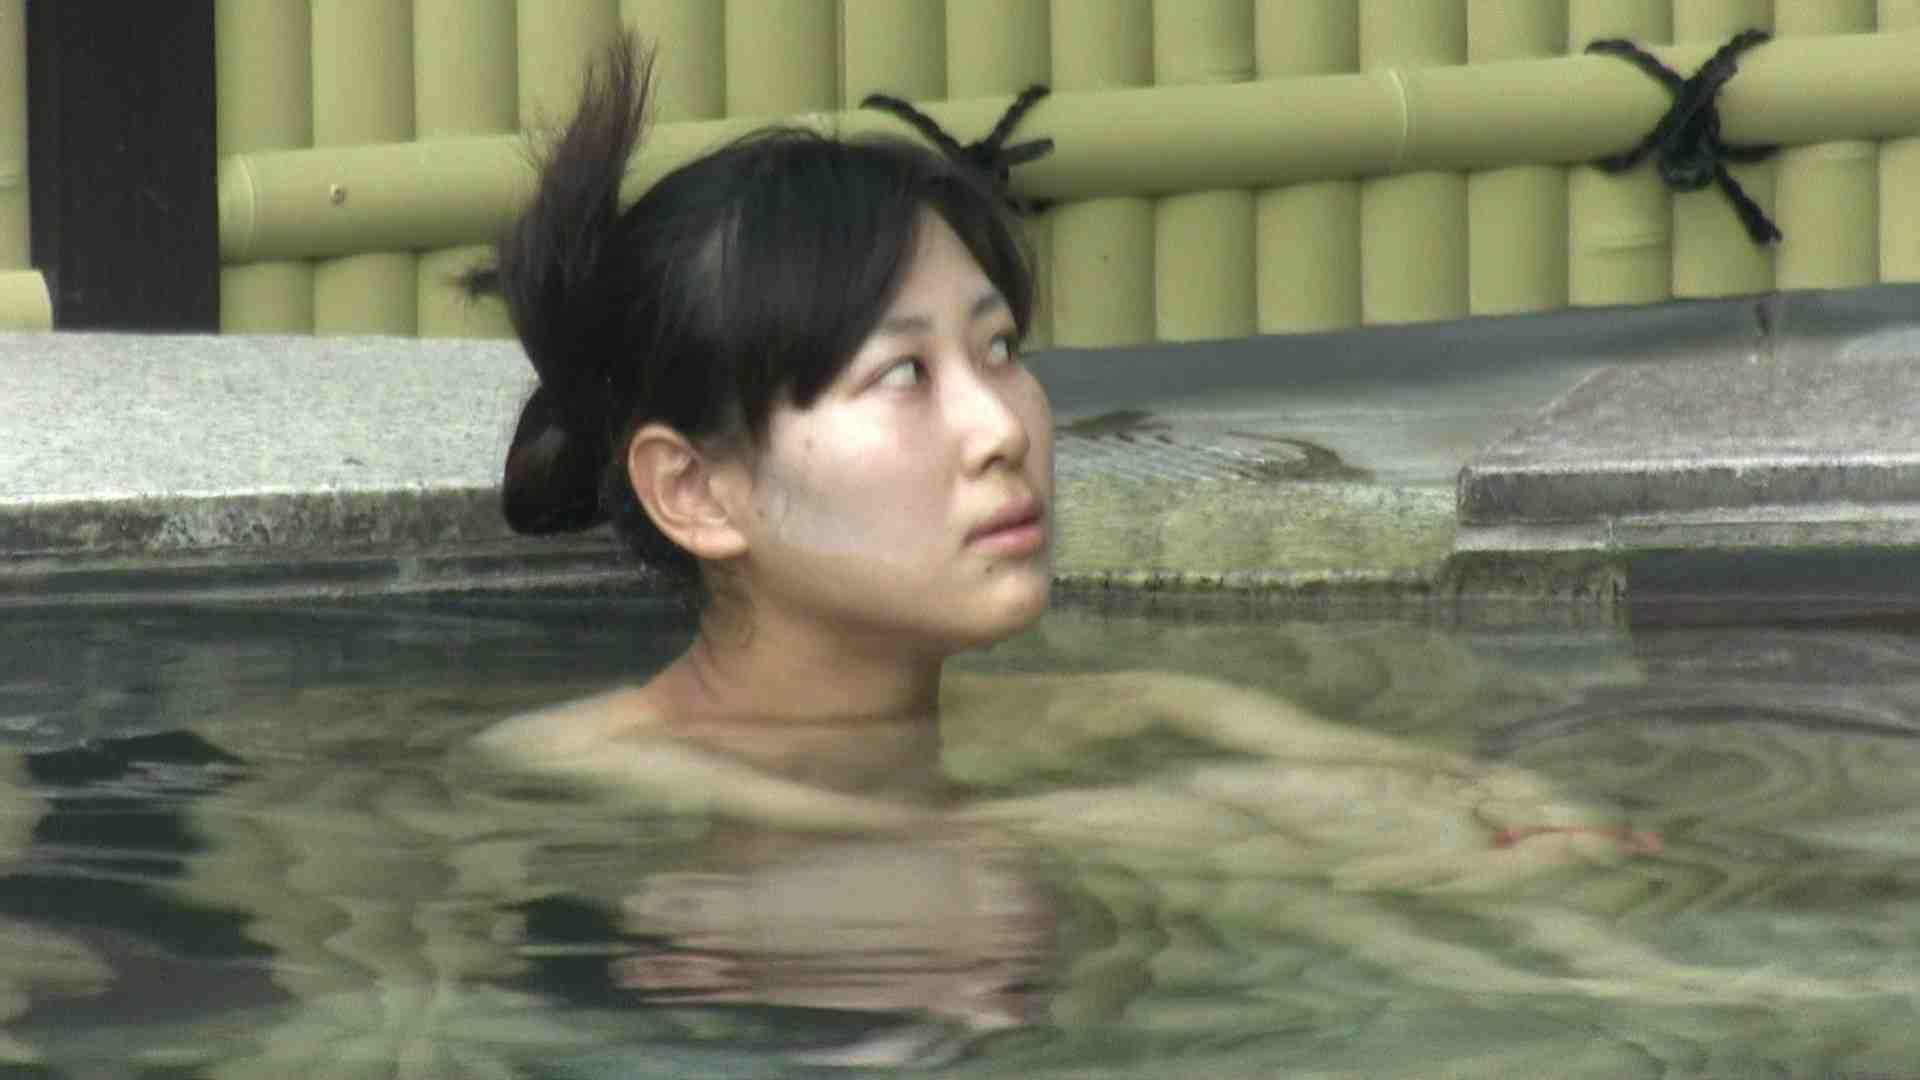 Aquaな露天風呂Vol.665 露天風呂編  86PIX 32